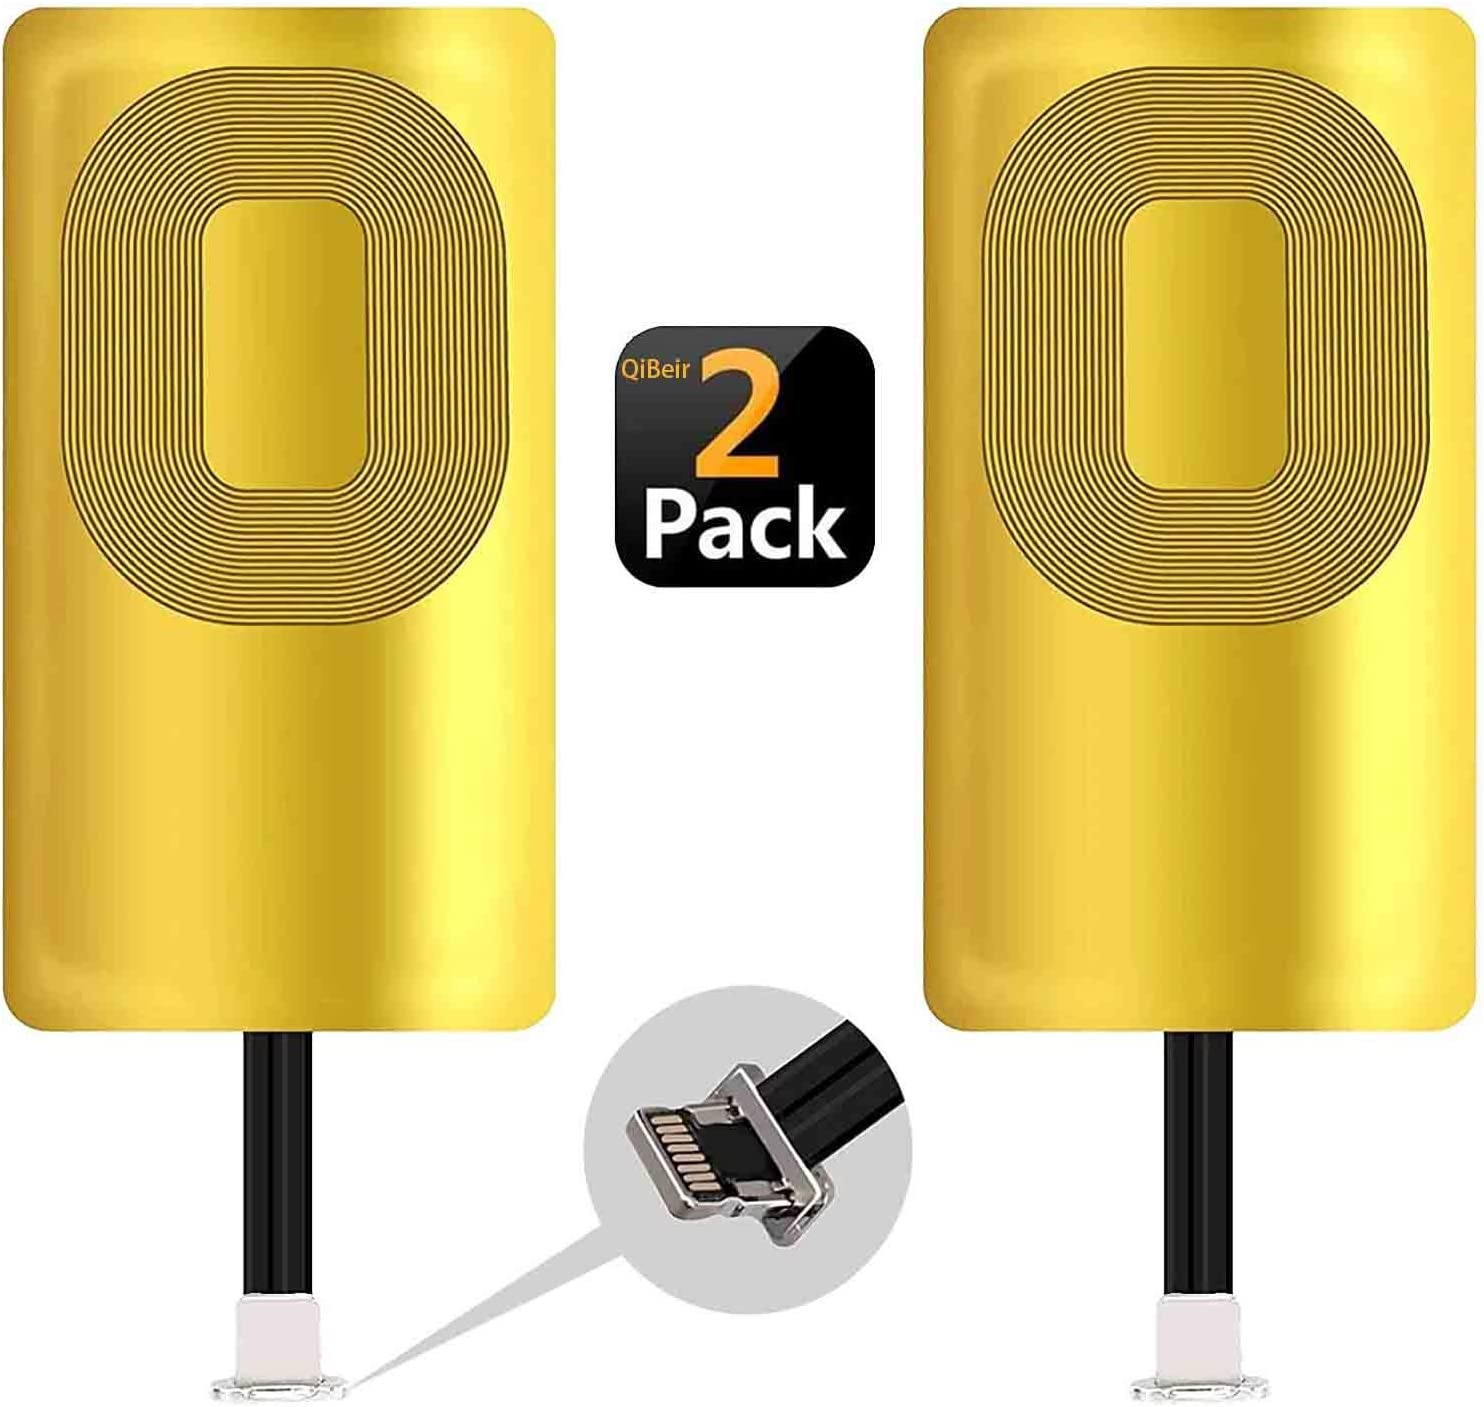 2 Pack QI Receiver Wireless Charging Receiver for iPhone 7/7 Plus/6/6 Plus/6s/6s Plus/5/5s/5c /SE Ultra-Slim iPhone Wireless Receiver 5W 1000mAh QI Charging Receiver iPhone (2PCS)